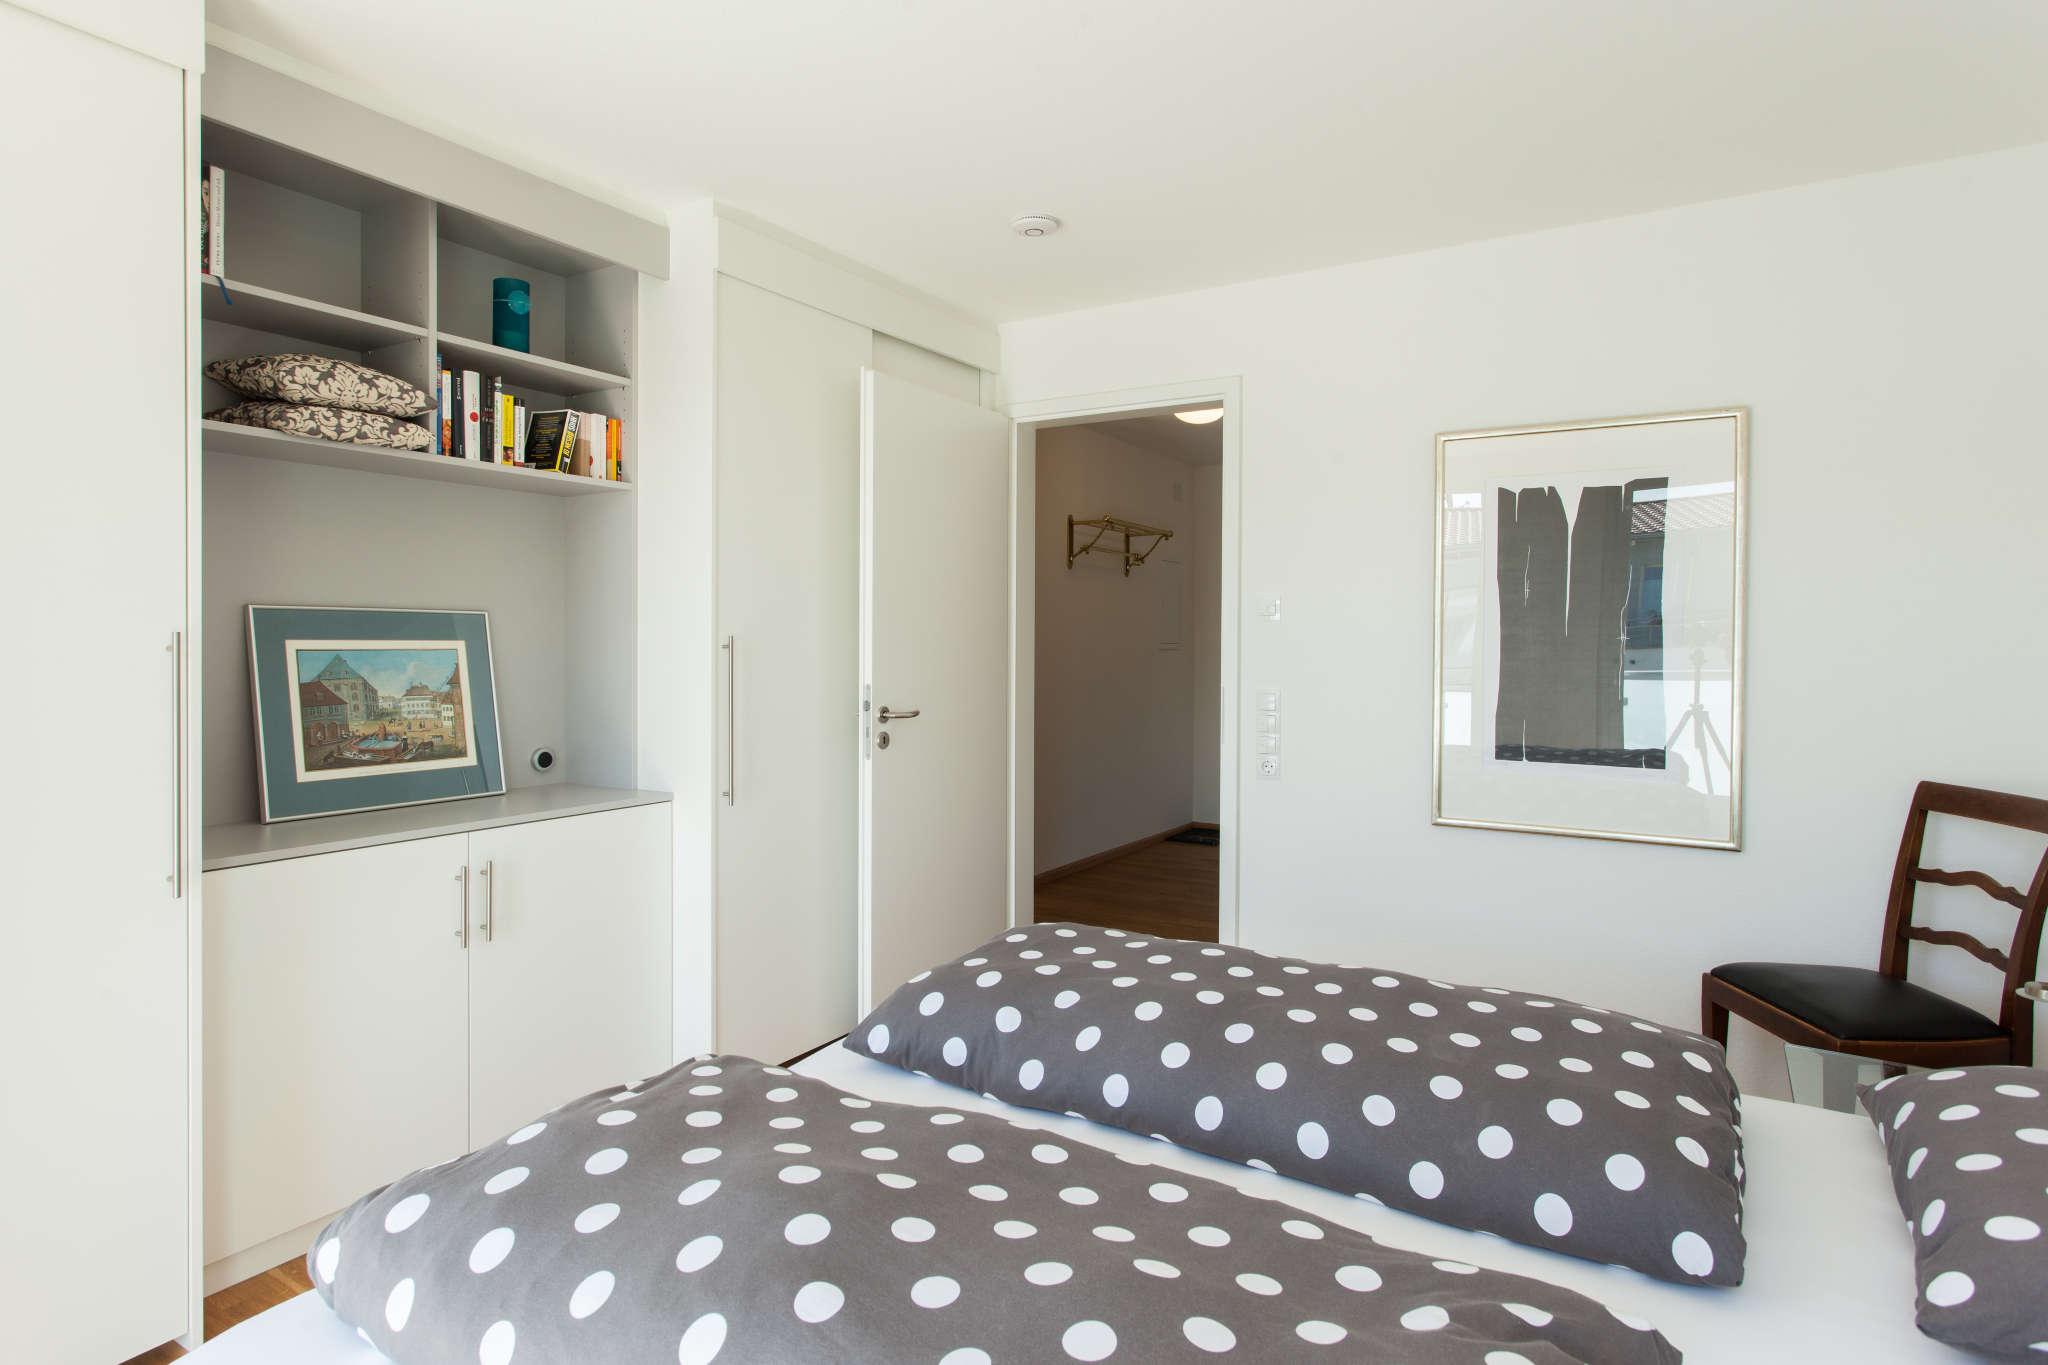 freiburg design appartement 3 in gundelfingen wildtal. Black Bedroom Furniture Sets. Home Design Ideas